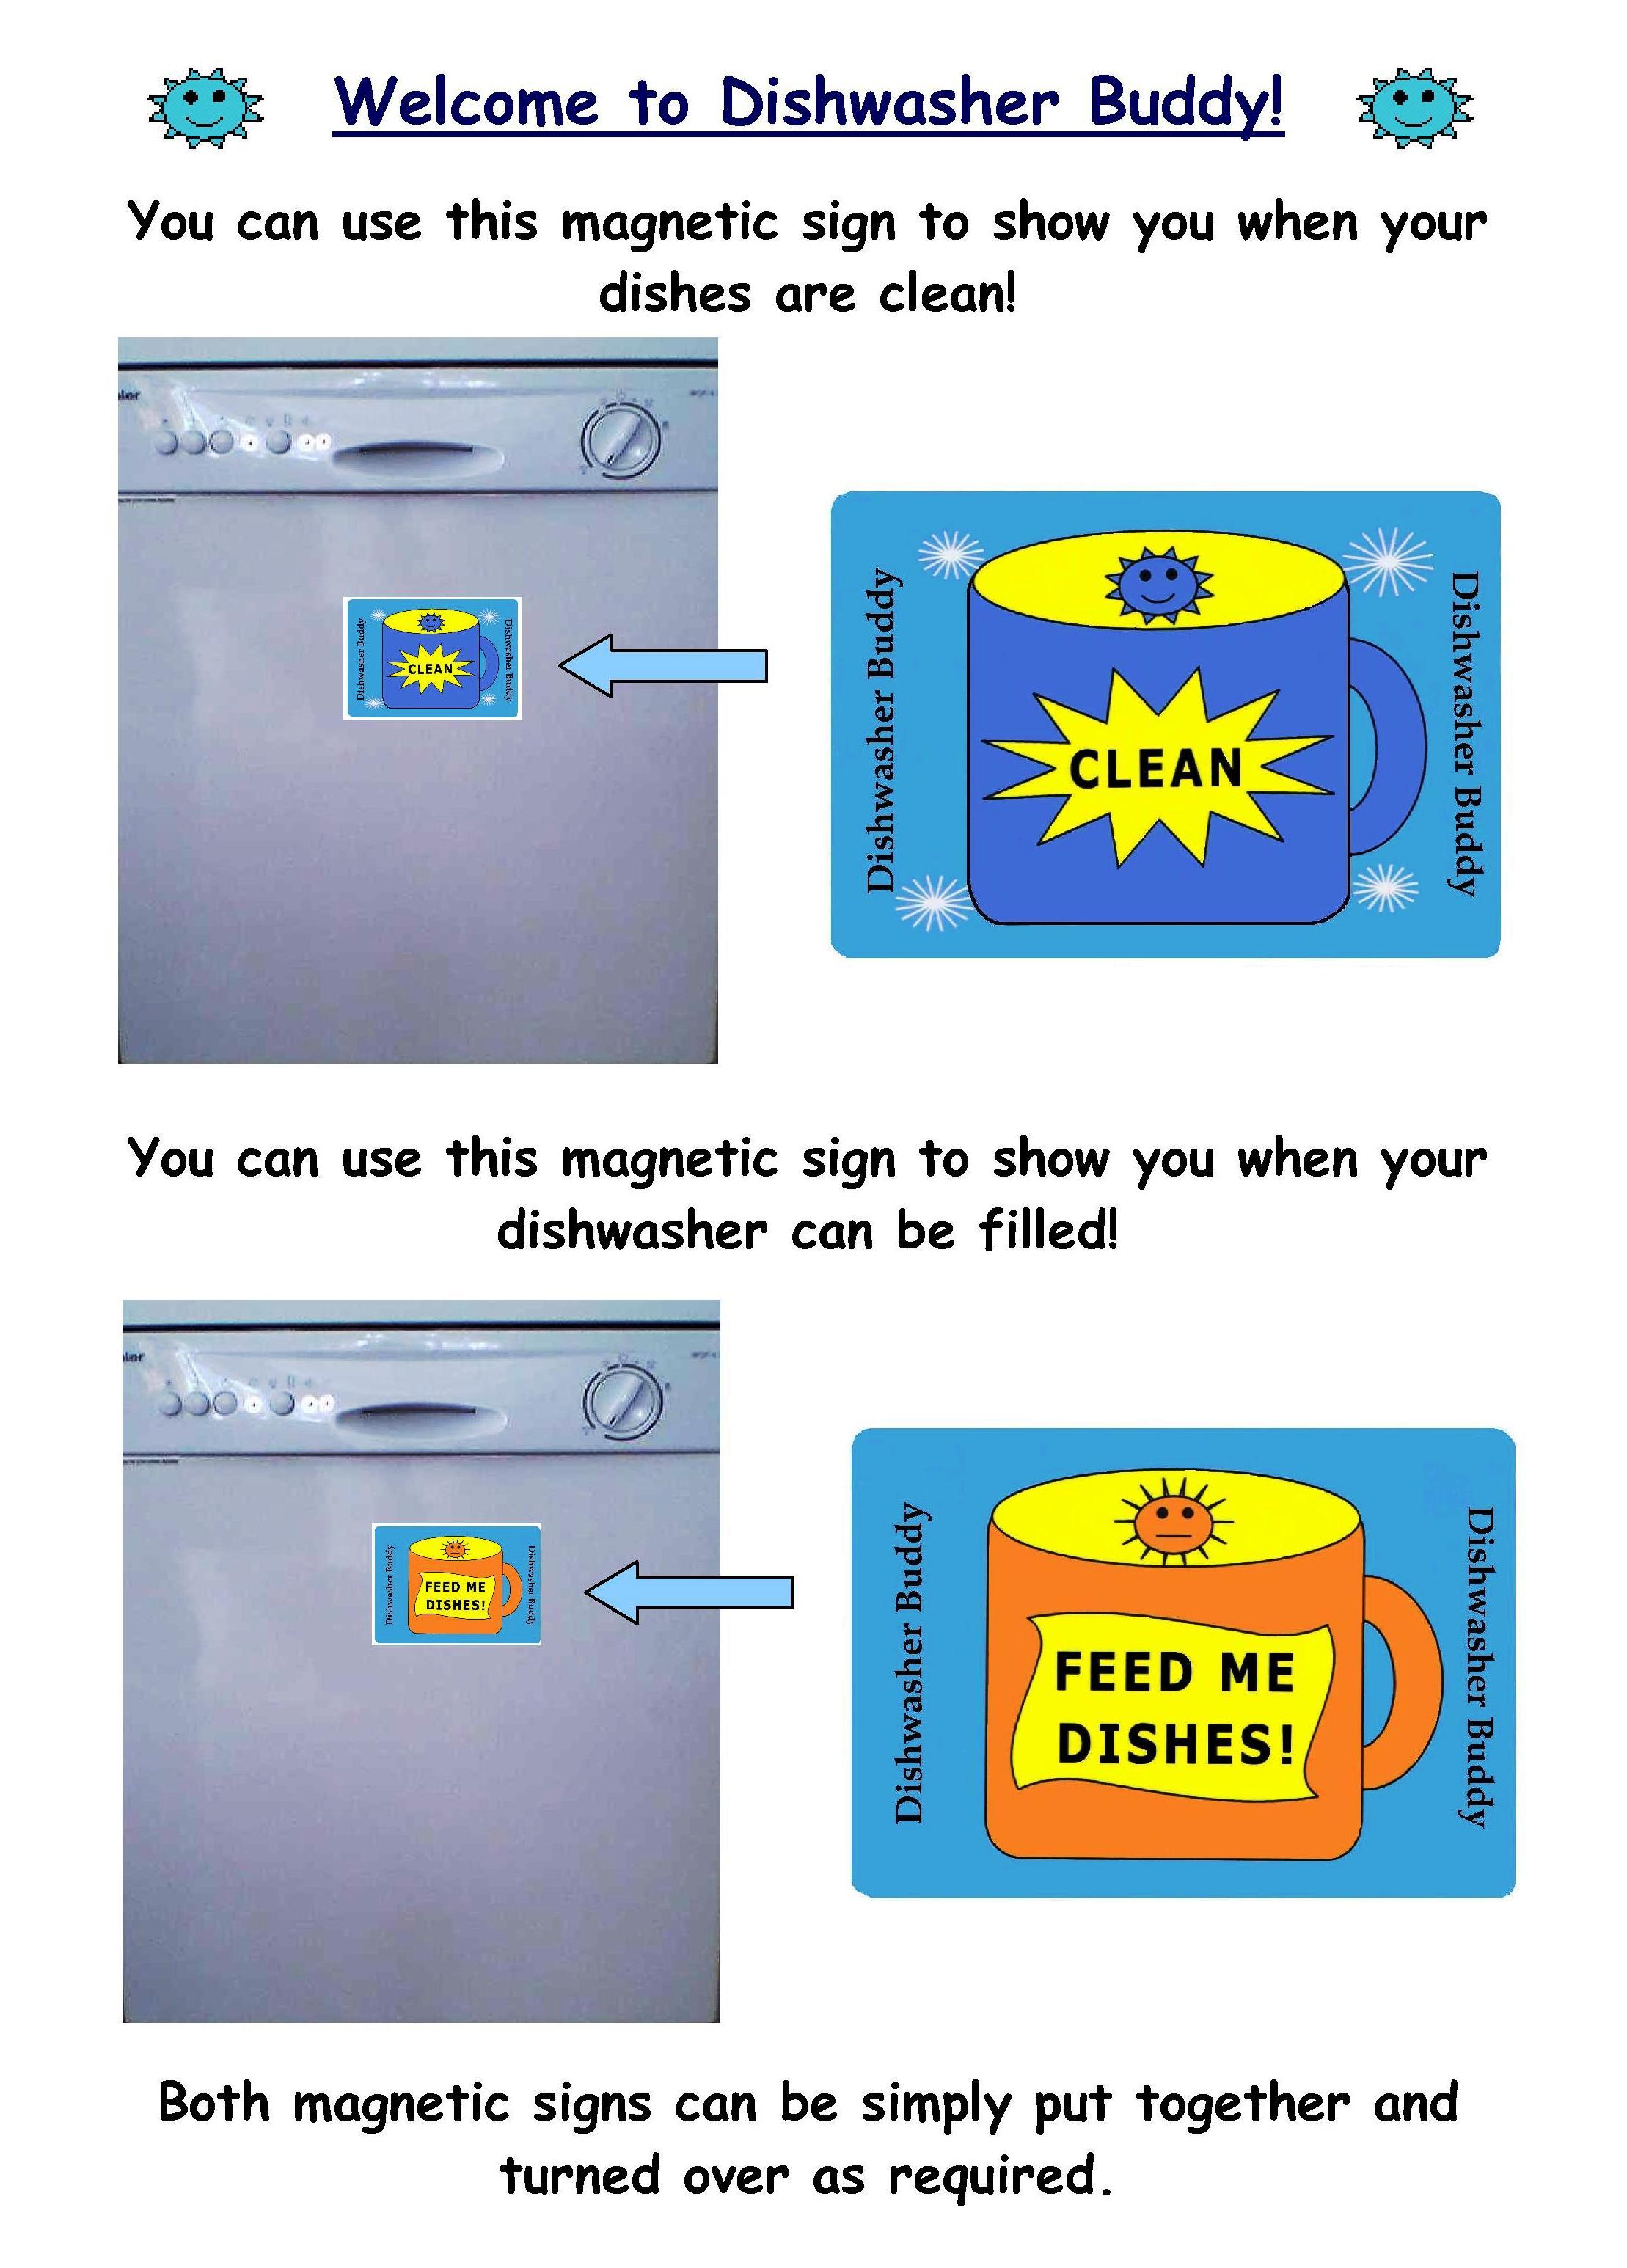 Dishwasher Buddy handout